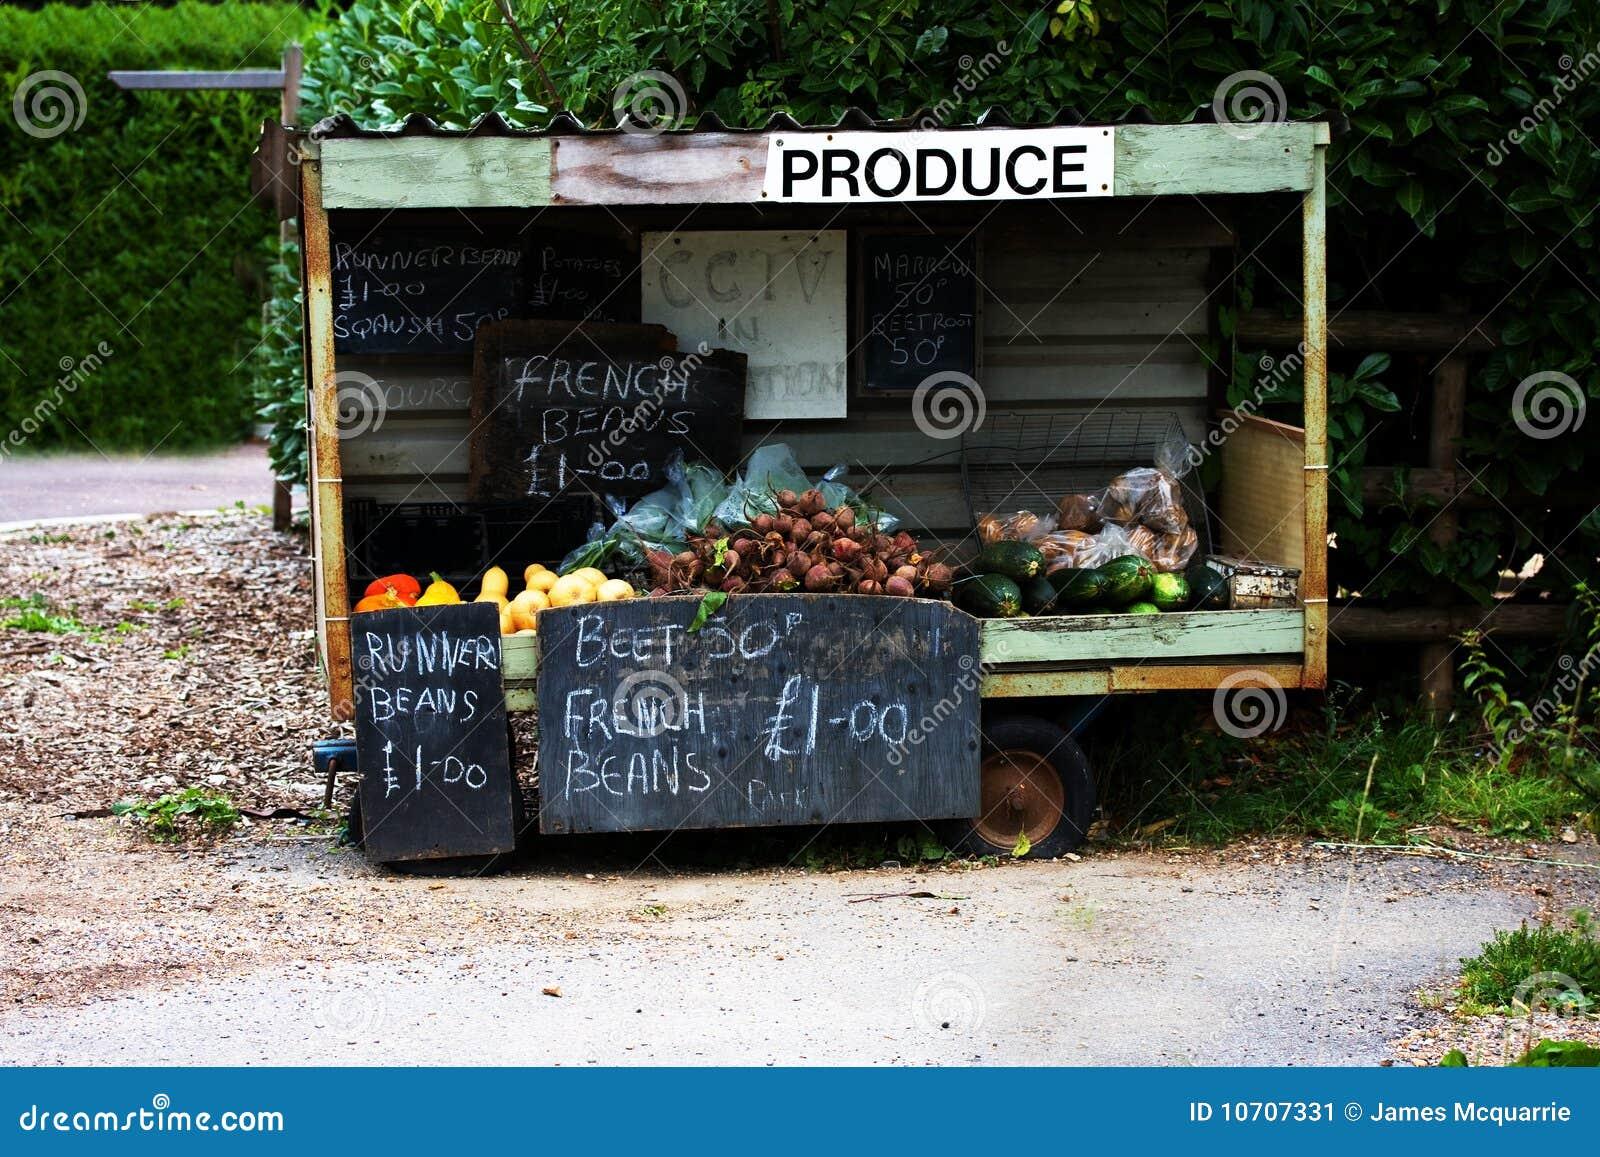 Roadside Stand Designs : Roadside produce cart stock image